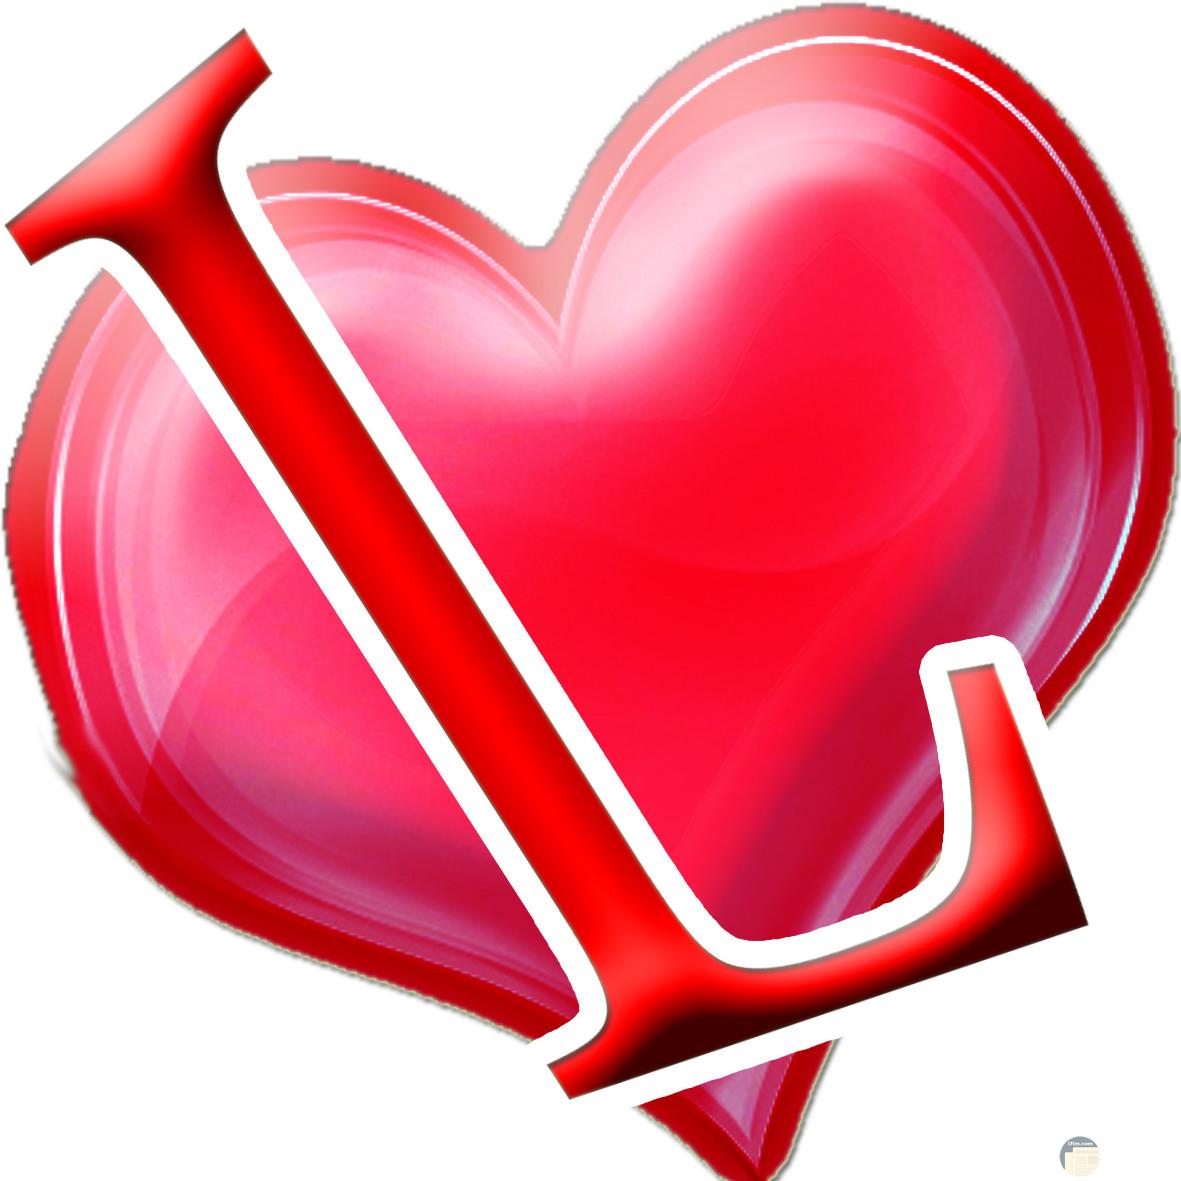 حرف L بداخل قلب احمر